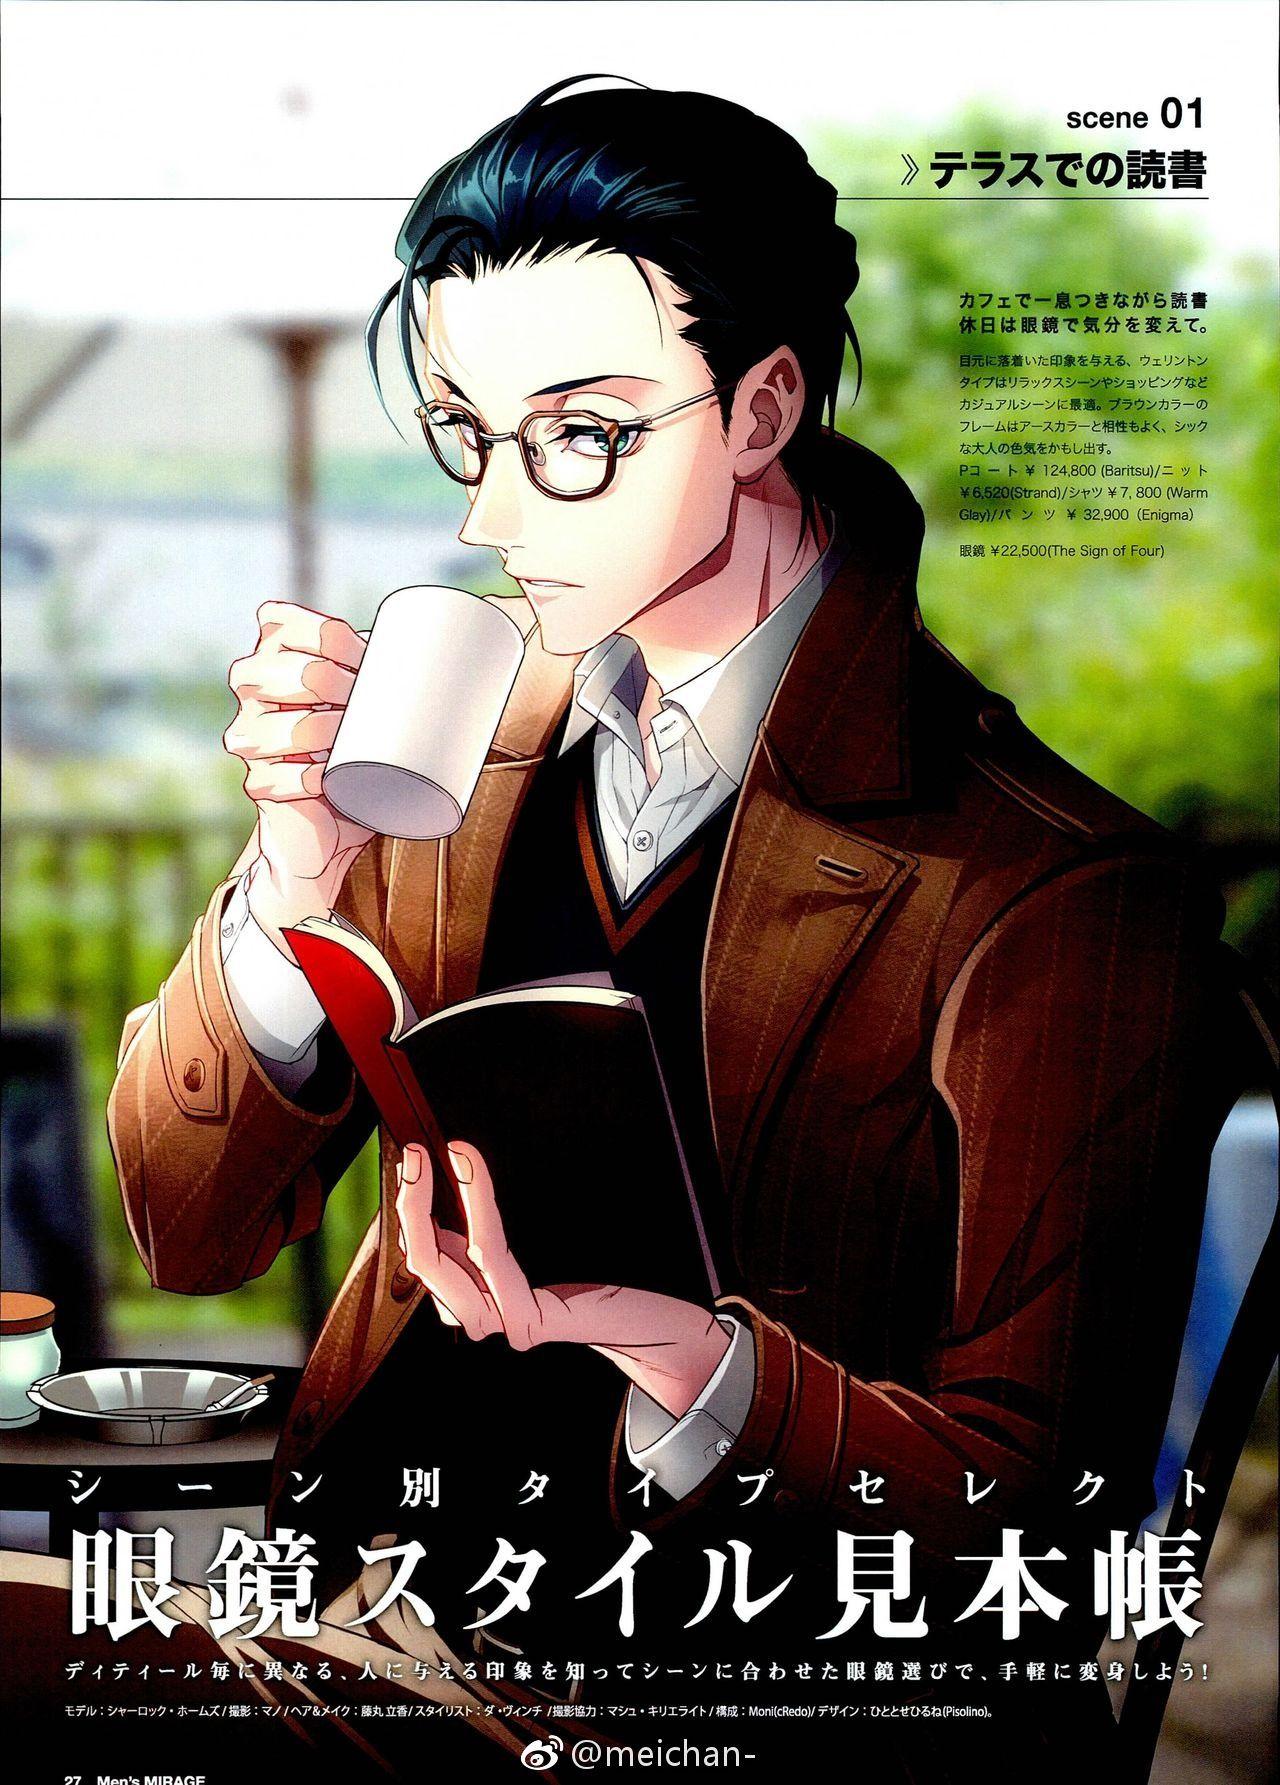 Sherlock Holmes【Fate/Grand Order】 Animé